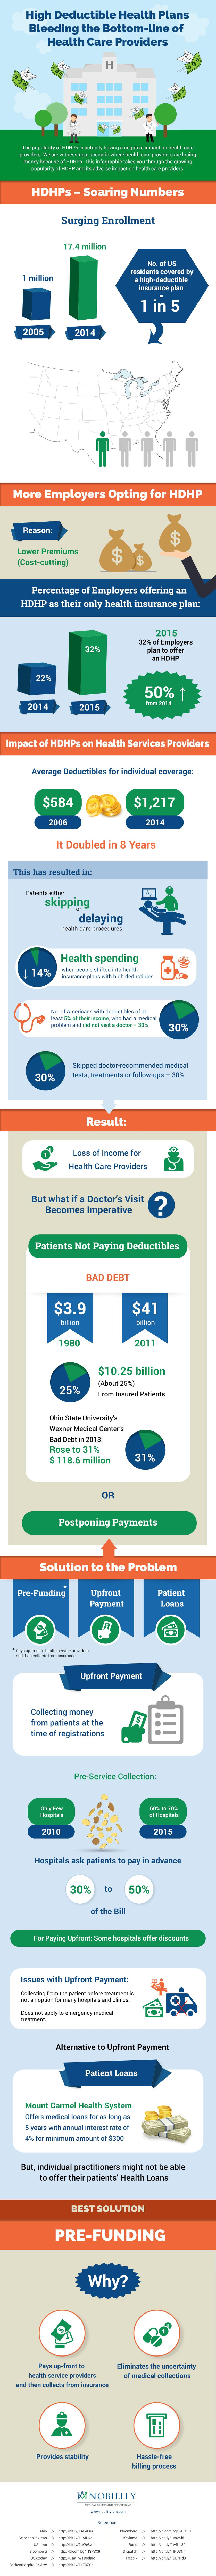 High Deductible Healthcare Plans Bleeding Bottom Line